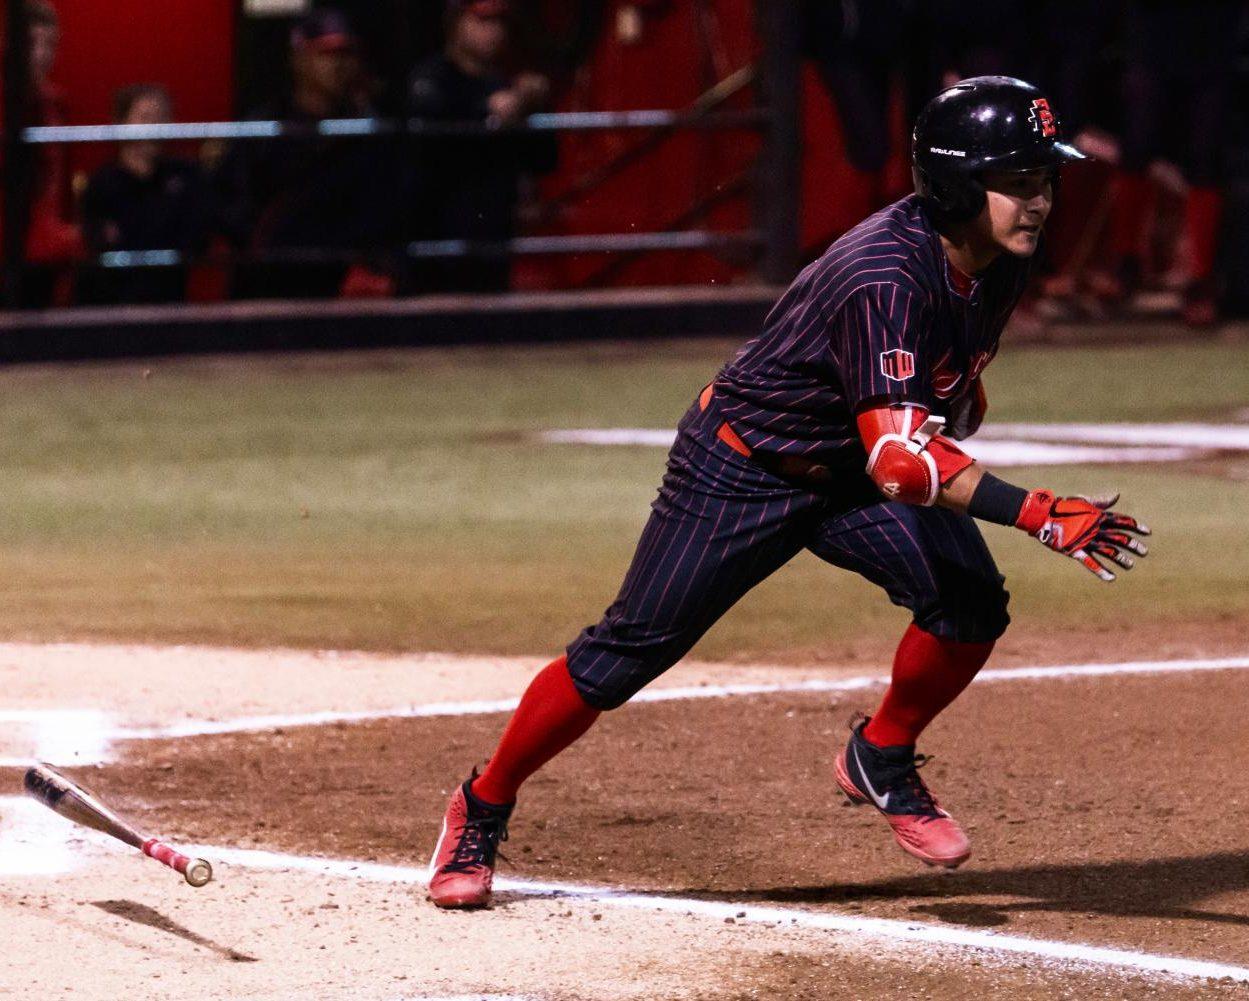 Sophomore outfielder Matt Ruddick runs down the first base line during the Aztecs' series against Nevada from March 8-10 at Tony Gwynn Stadium.